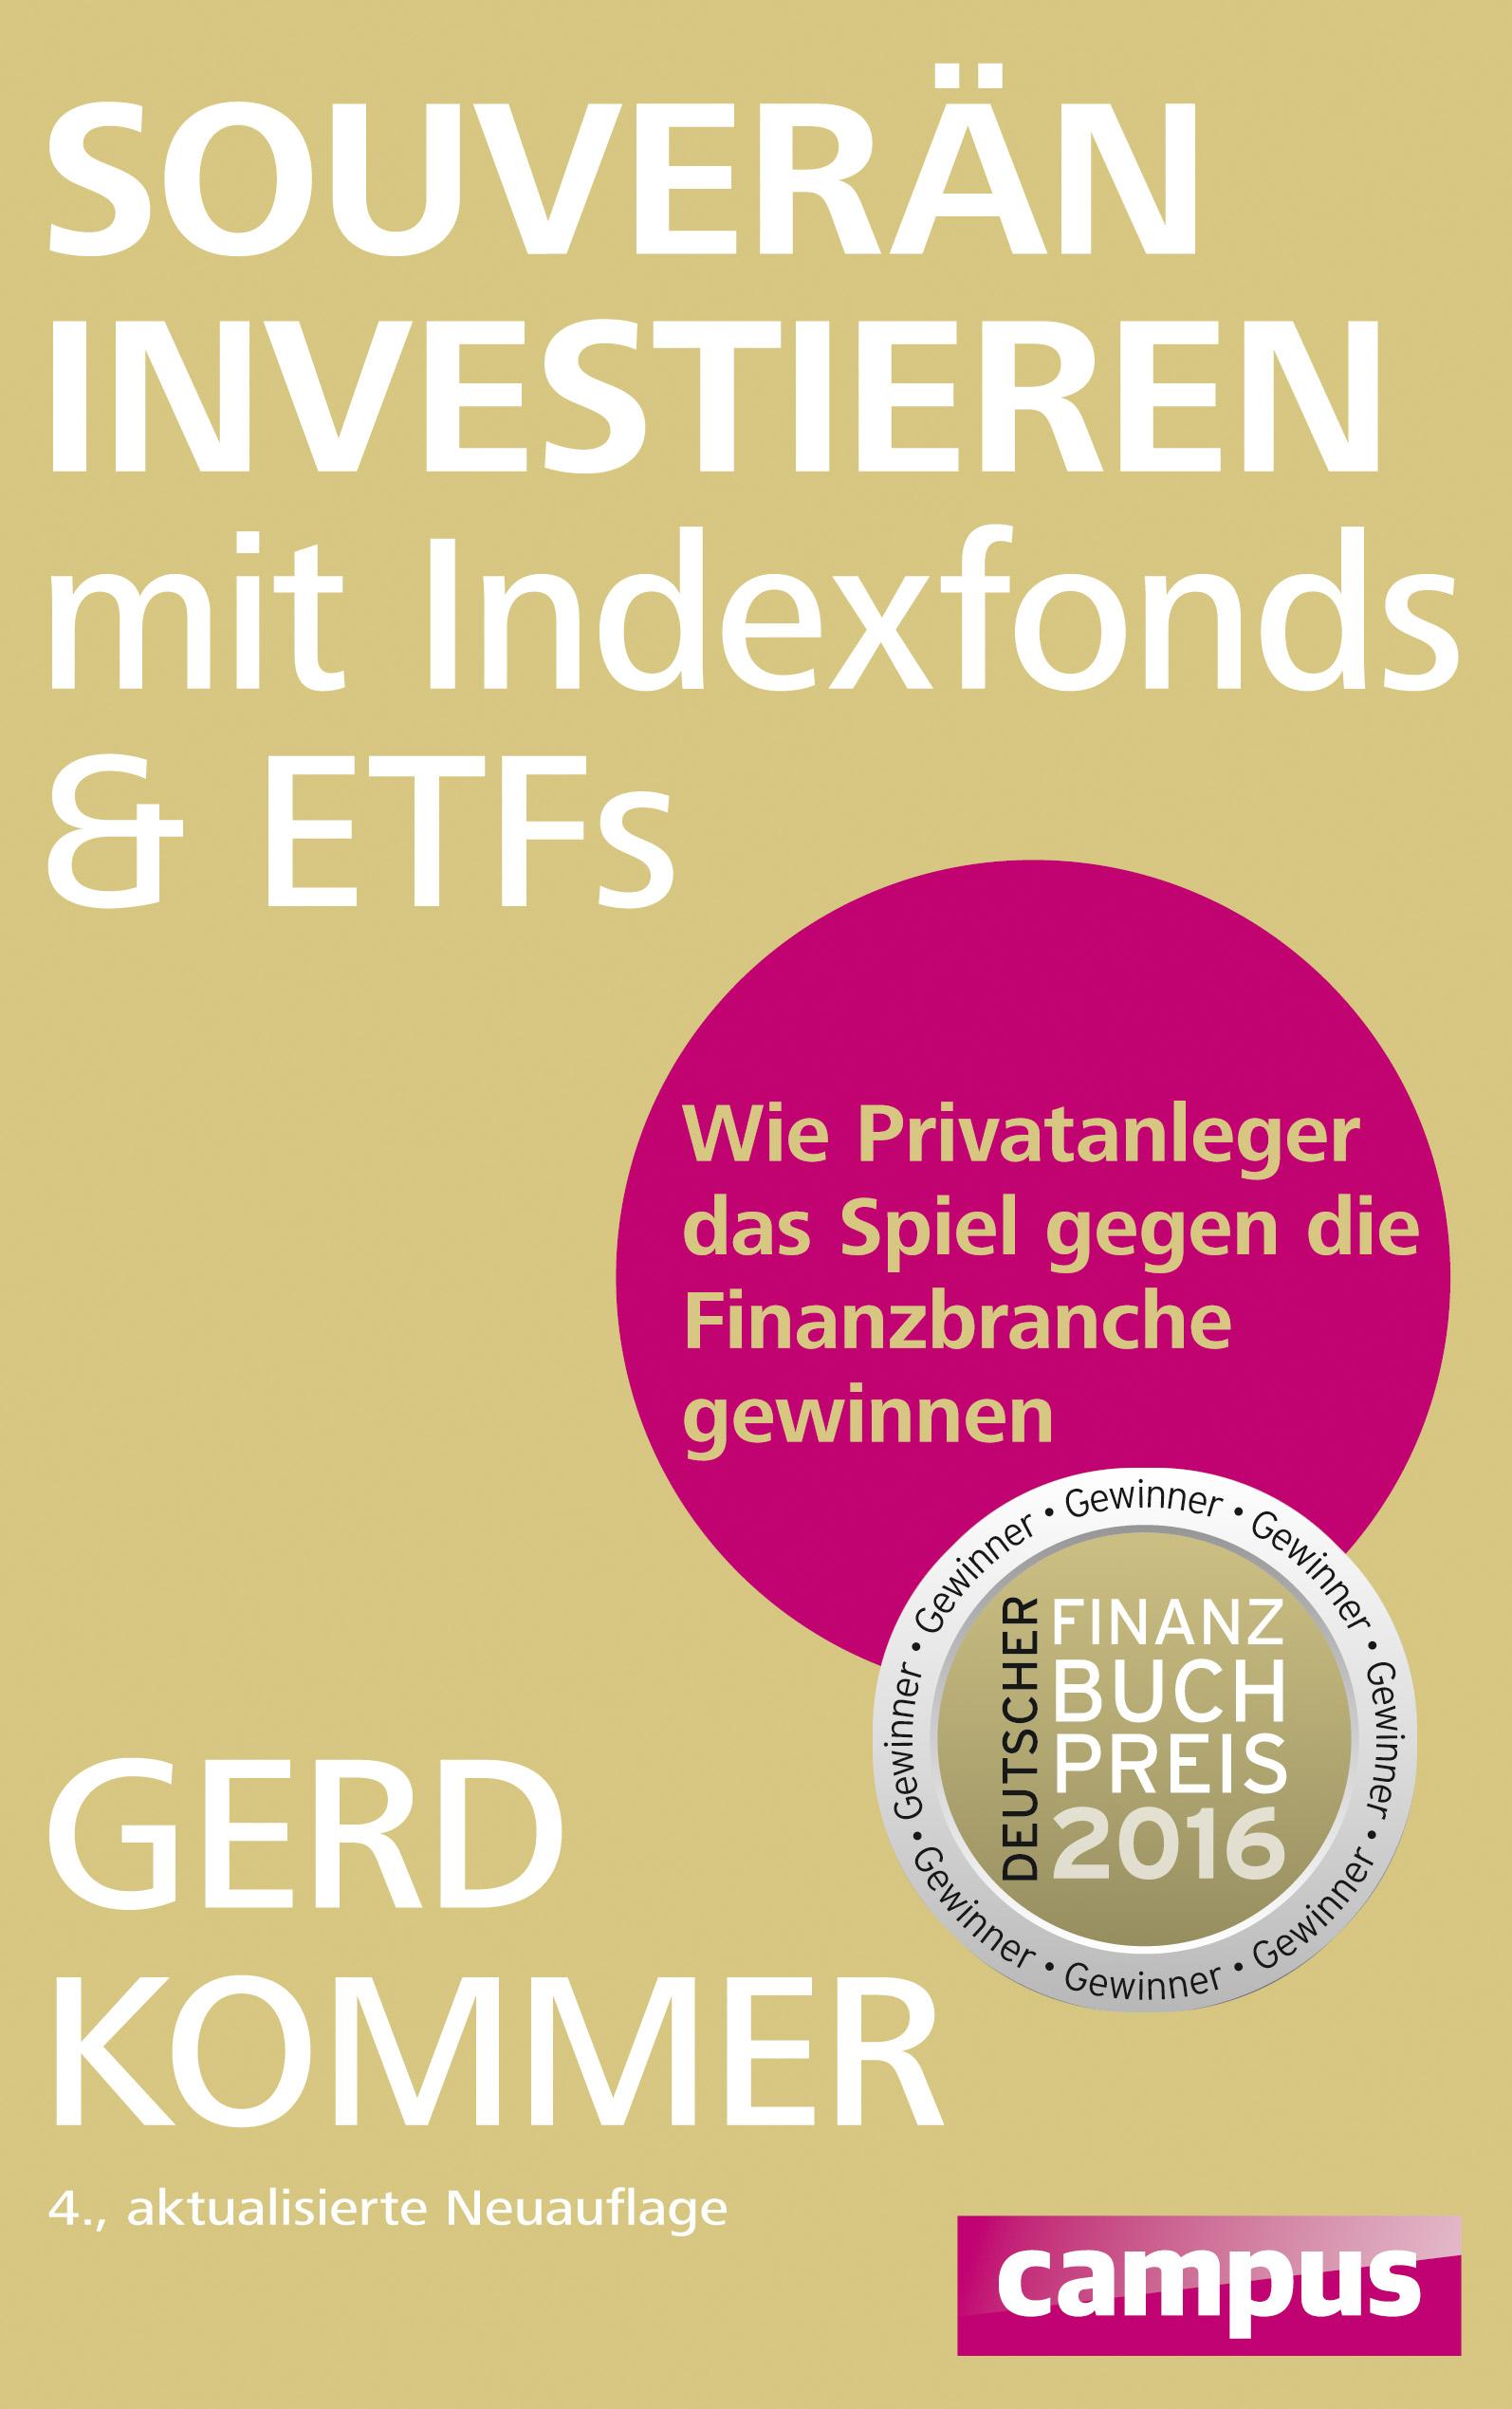 Corporate Publishing goes Premium: Bücher als Marketing-Instrument- public-relations